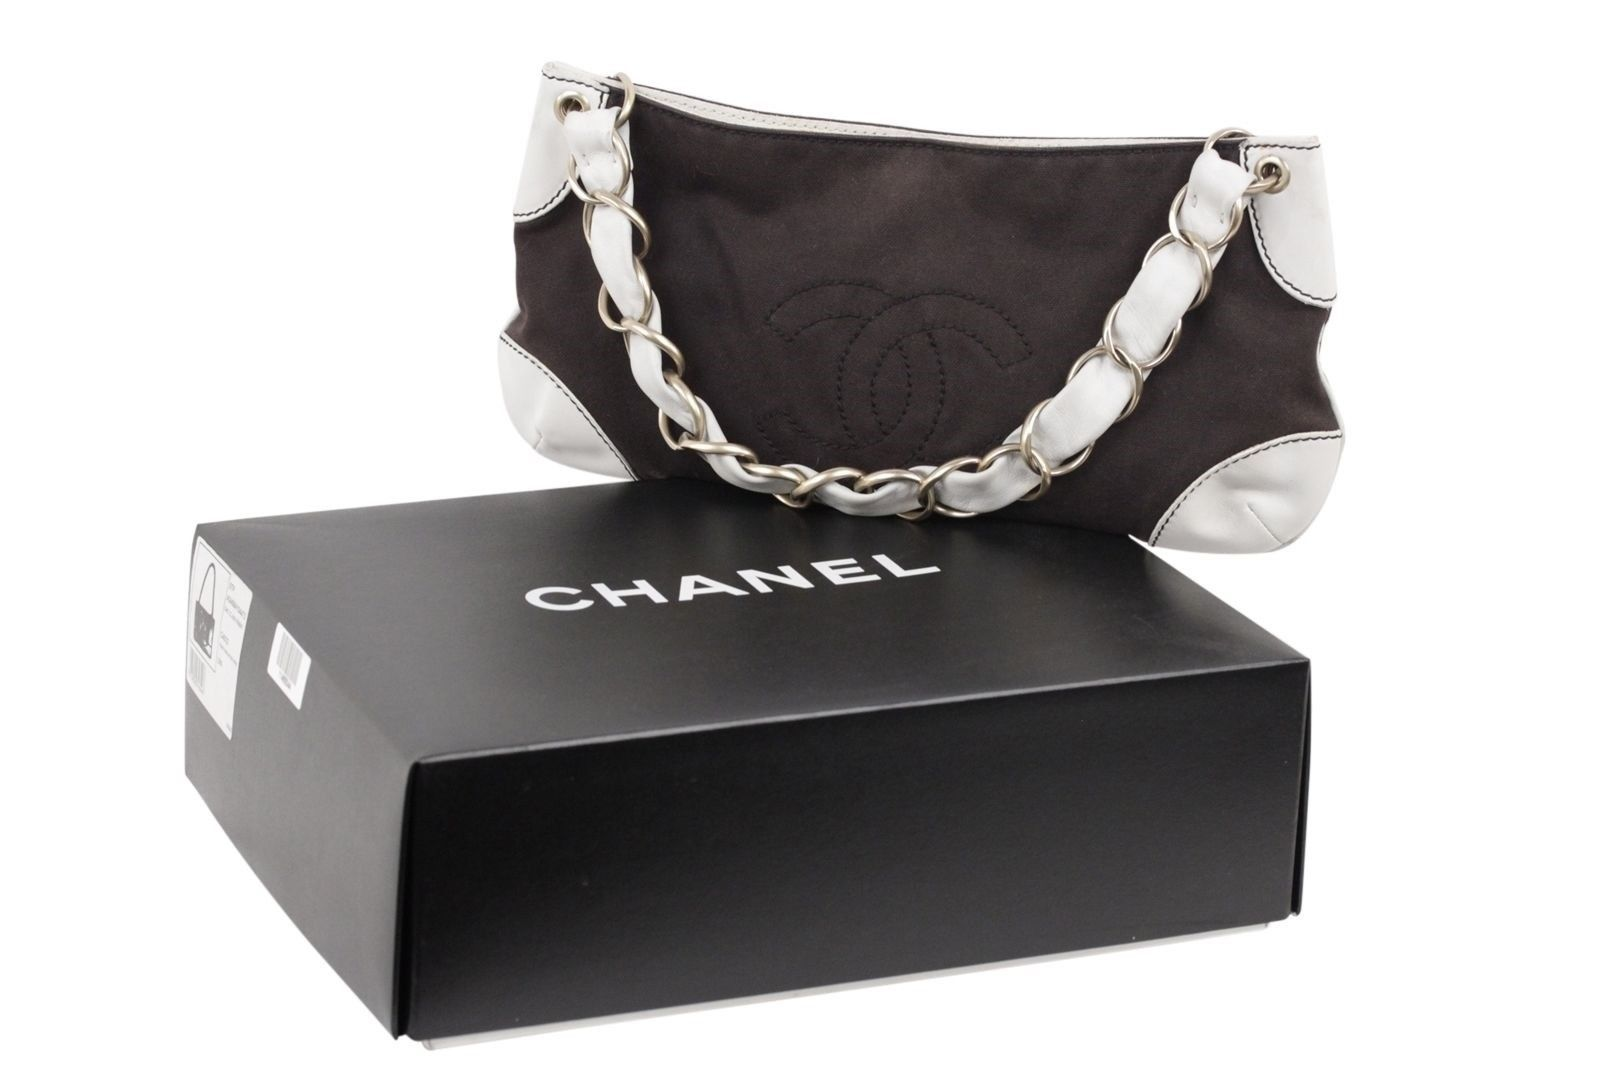 b298cb9dc127 S l1600. S l1600. Previous. Authentic CHANEL Brown Canvas & White Leather  SHOULDER BAG Purse TOTE w/CC LOGO